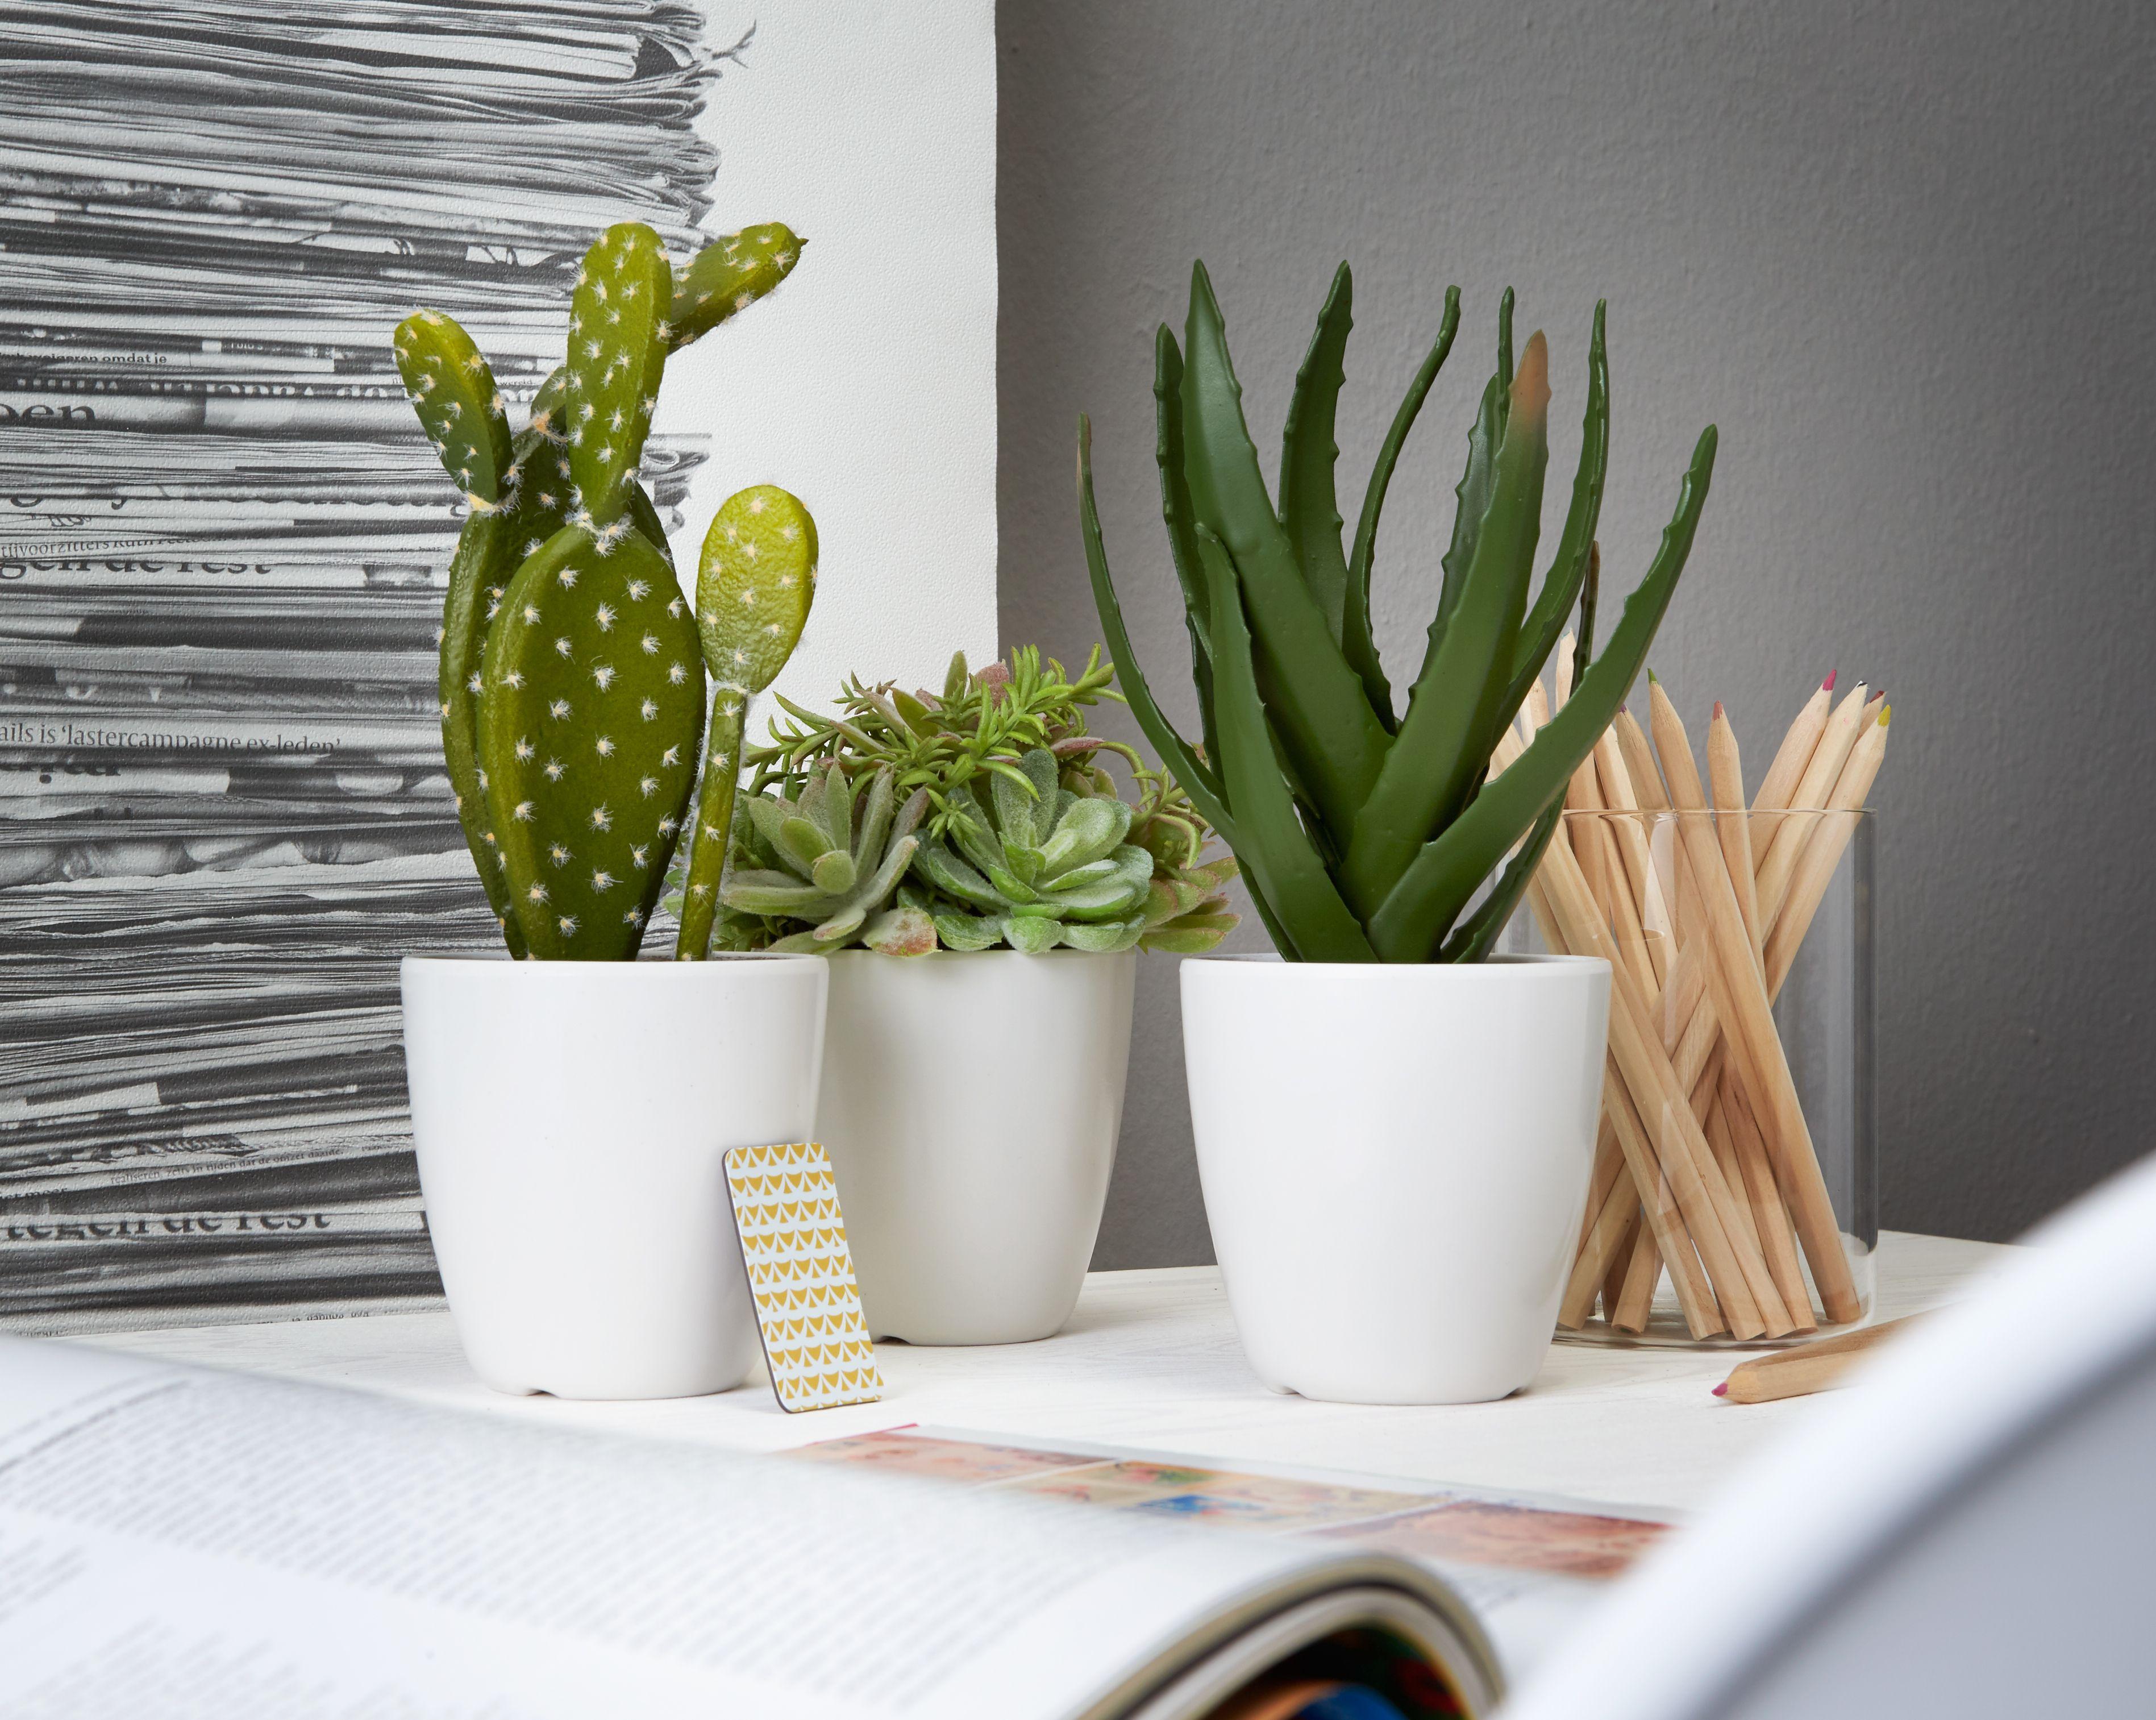 c1e8d5435d1b09a37fc1eddee846a2cc Ze Cactus Houseplants on cactus names list, cactus at lowe's, cactus cuts on skin, cactus fungus disease cure, cactus garden, cactus identification, cactus tumblr, cactus planting ideas, cactus flowers, cactus name with leaves, cactus black spot disease, cactus night blooming cereus, cactus sprouts, cactus thin fingers, cactus wildflowers, cactus propagation, cactus with white hair, cactus in bloom, cactus plants,